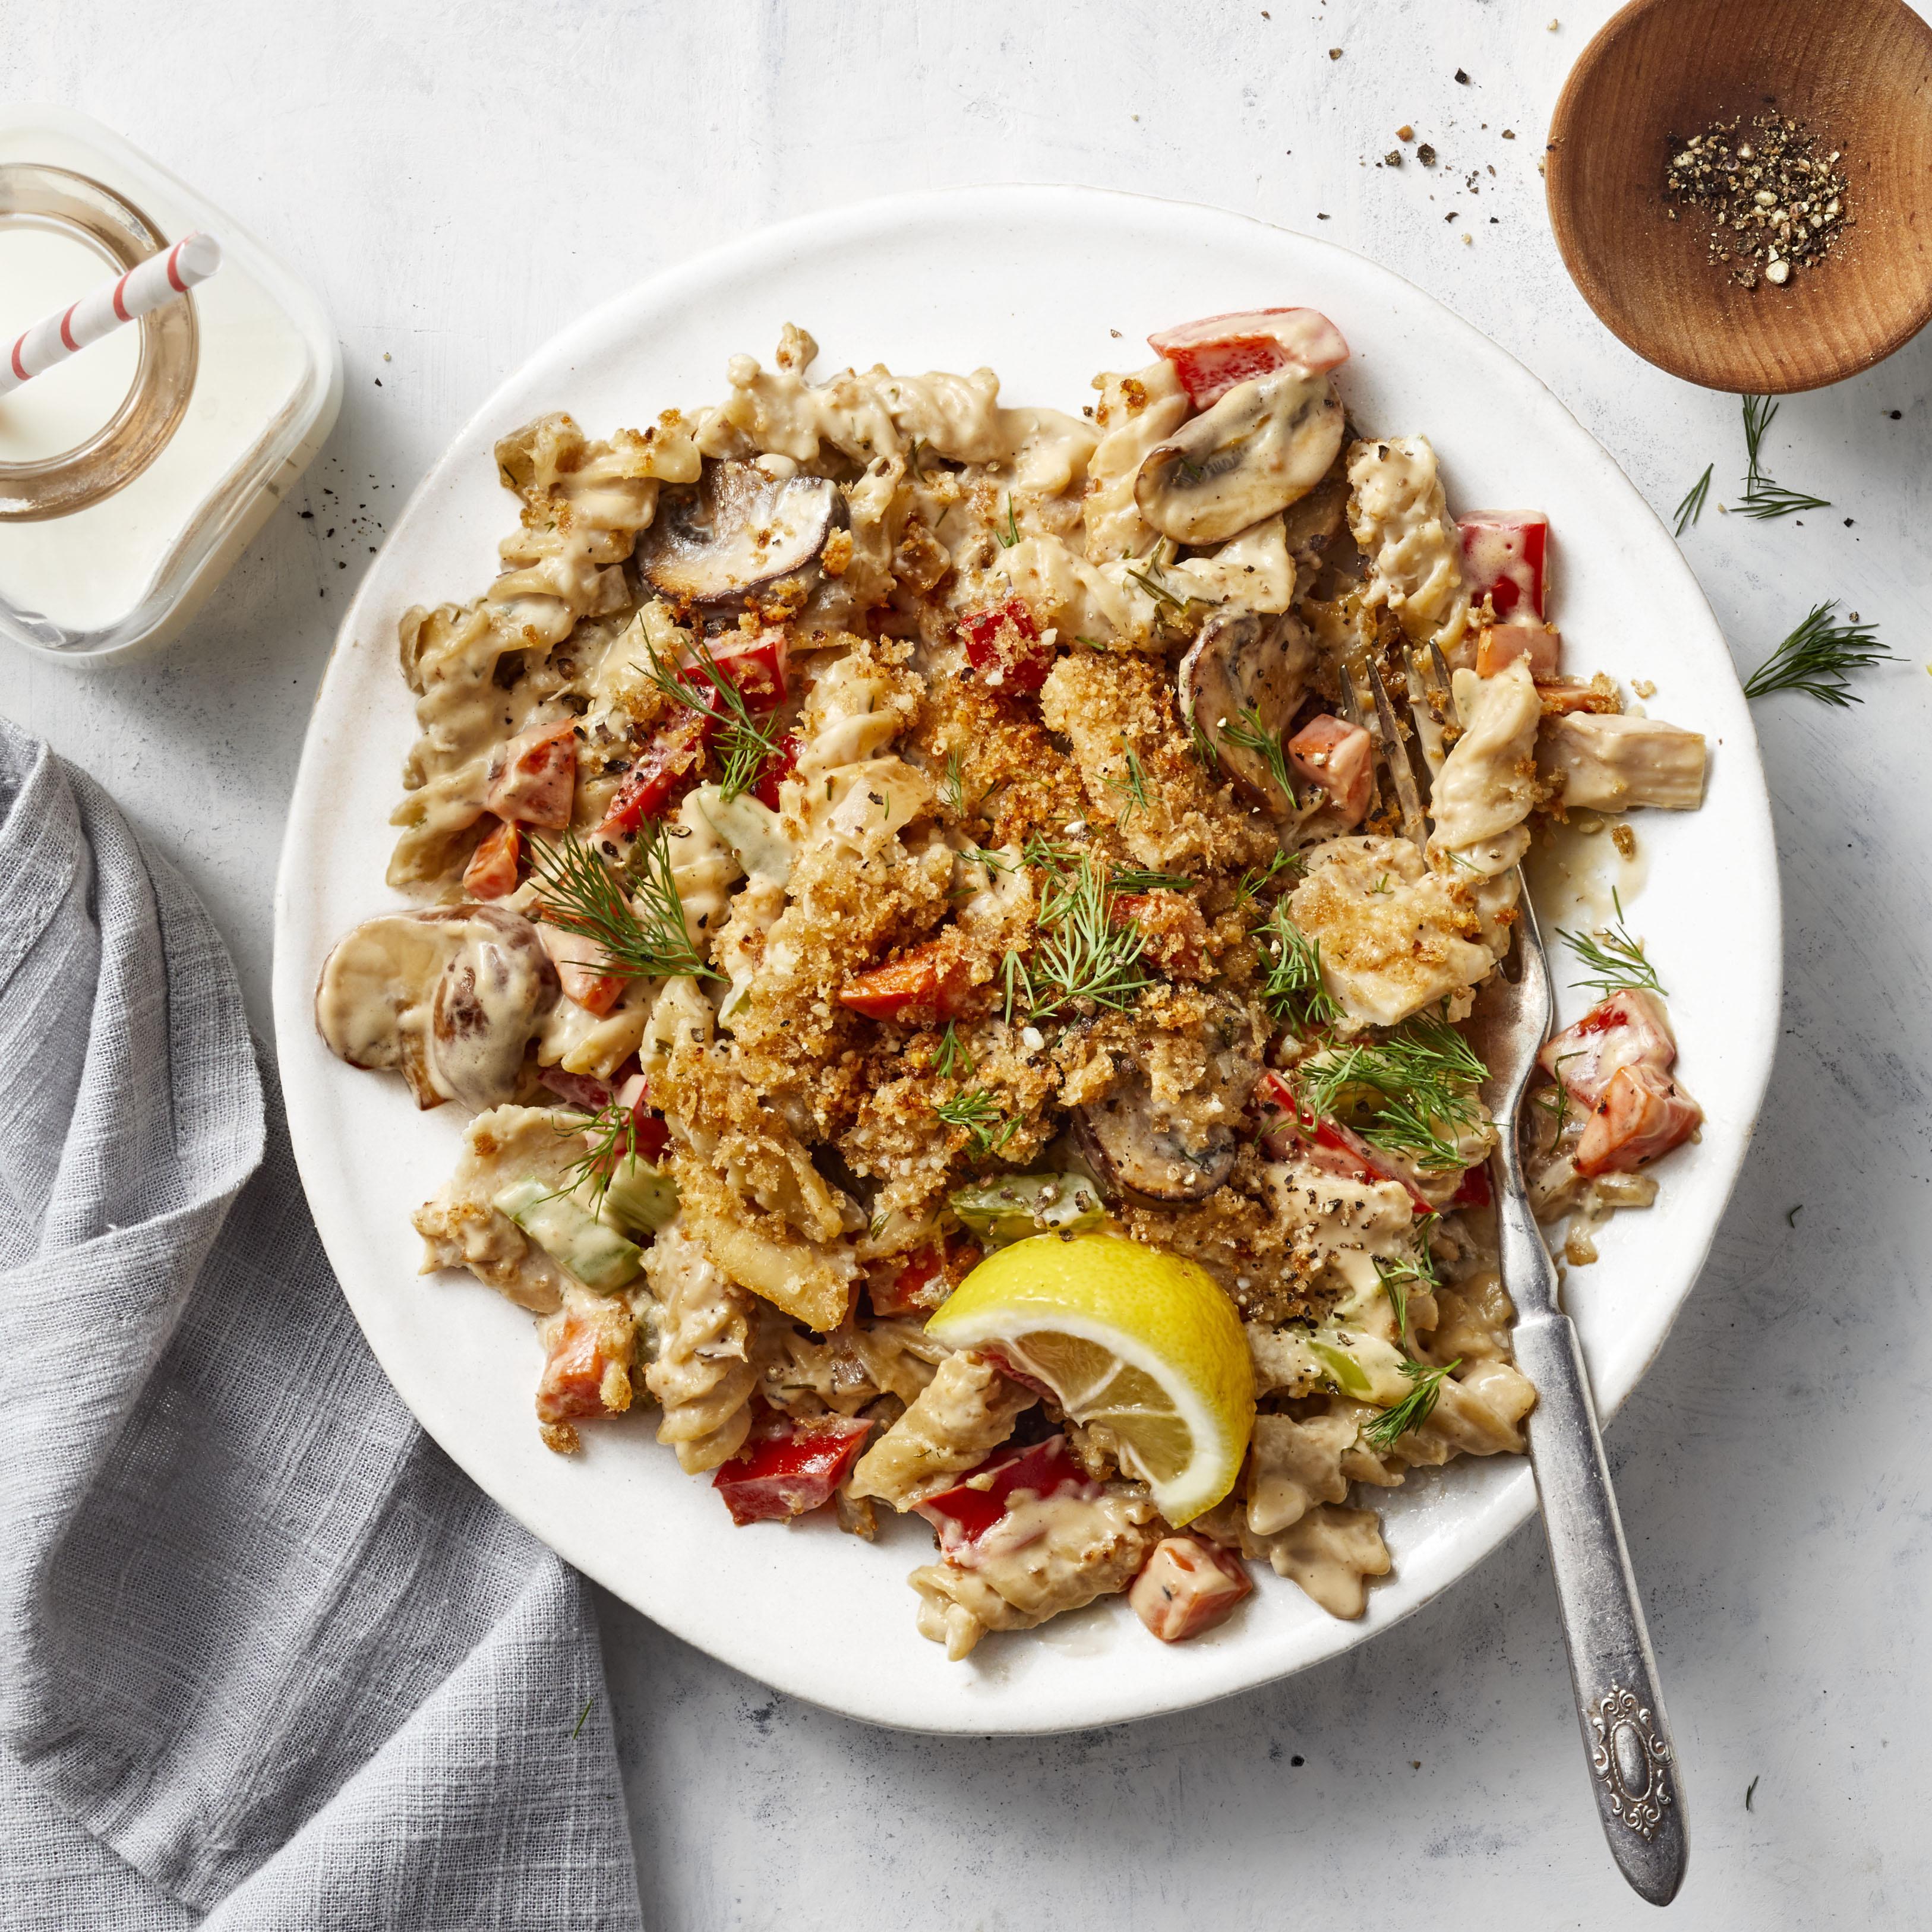 Healthier Tuna Noodle Casserole